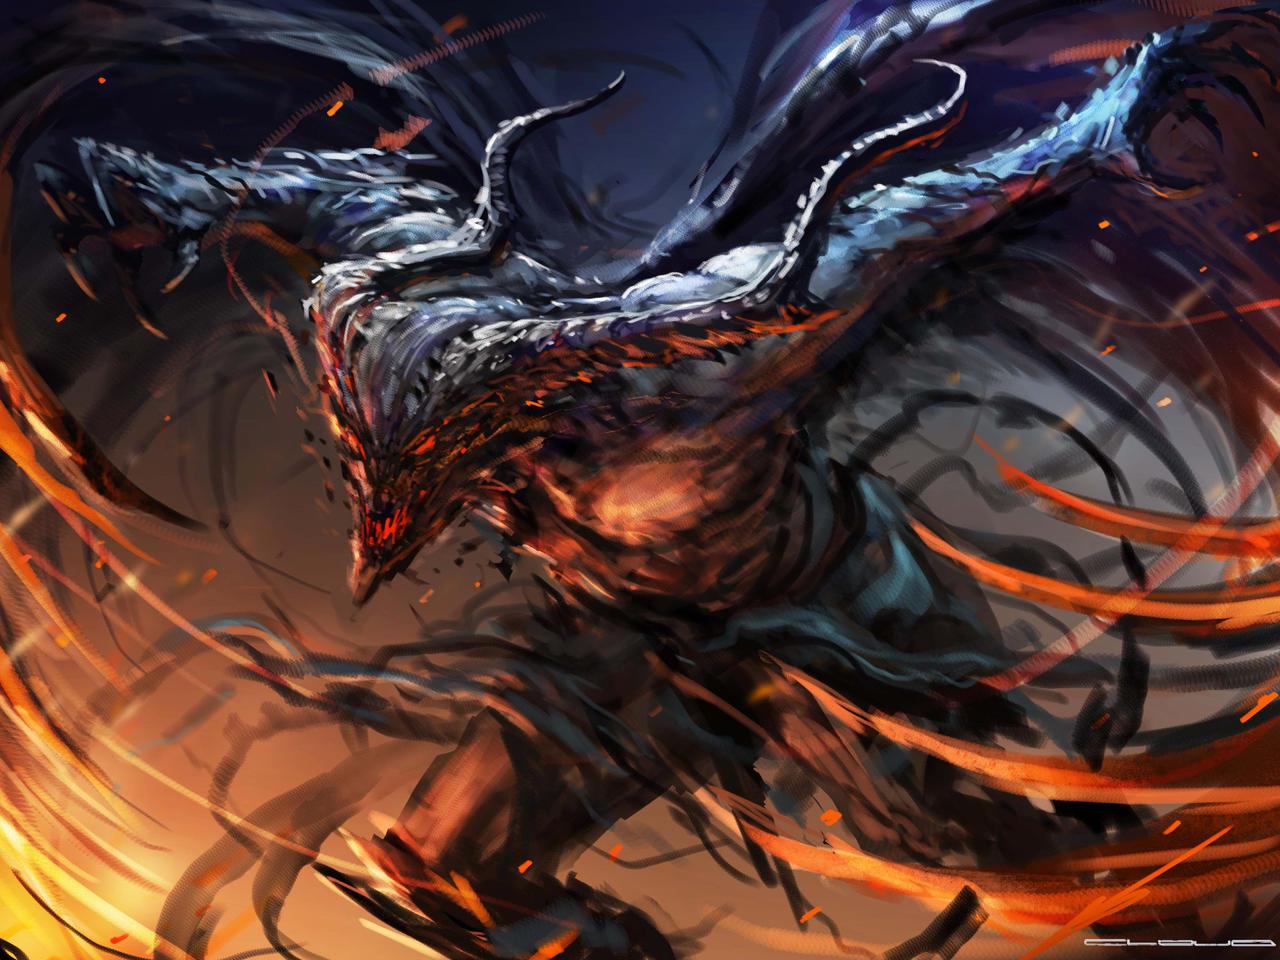 Winged demon by darkcloud013 on deviantart - Portal entree ownership ...